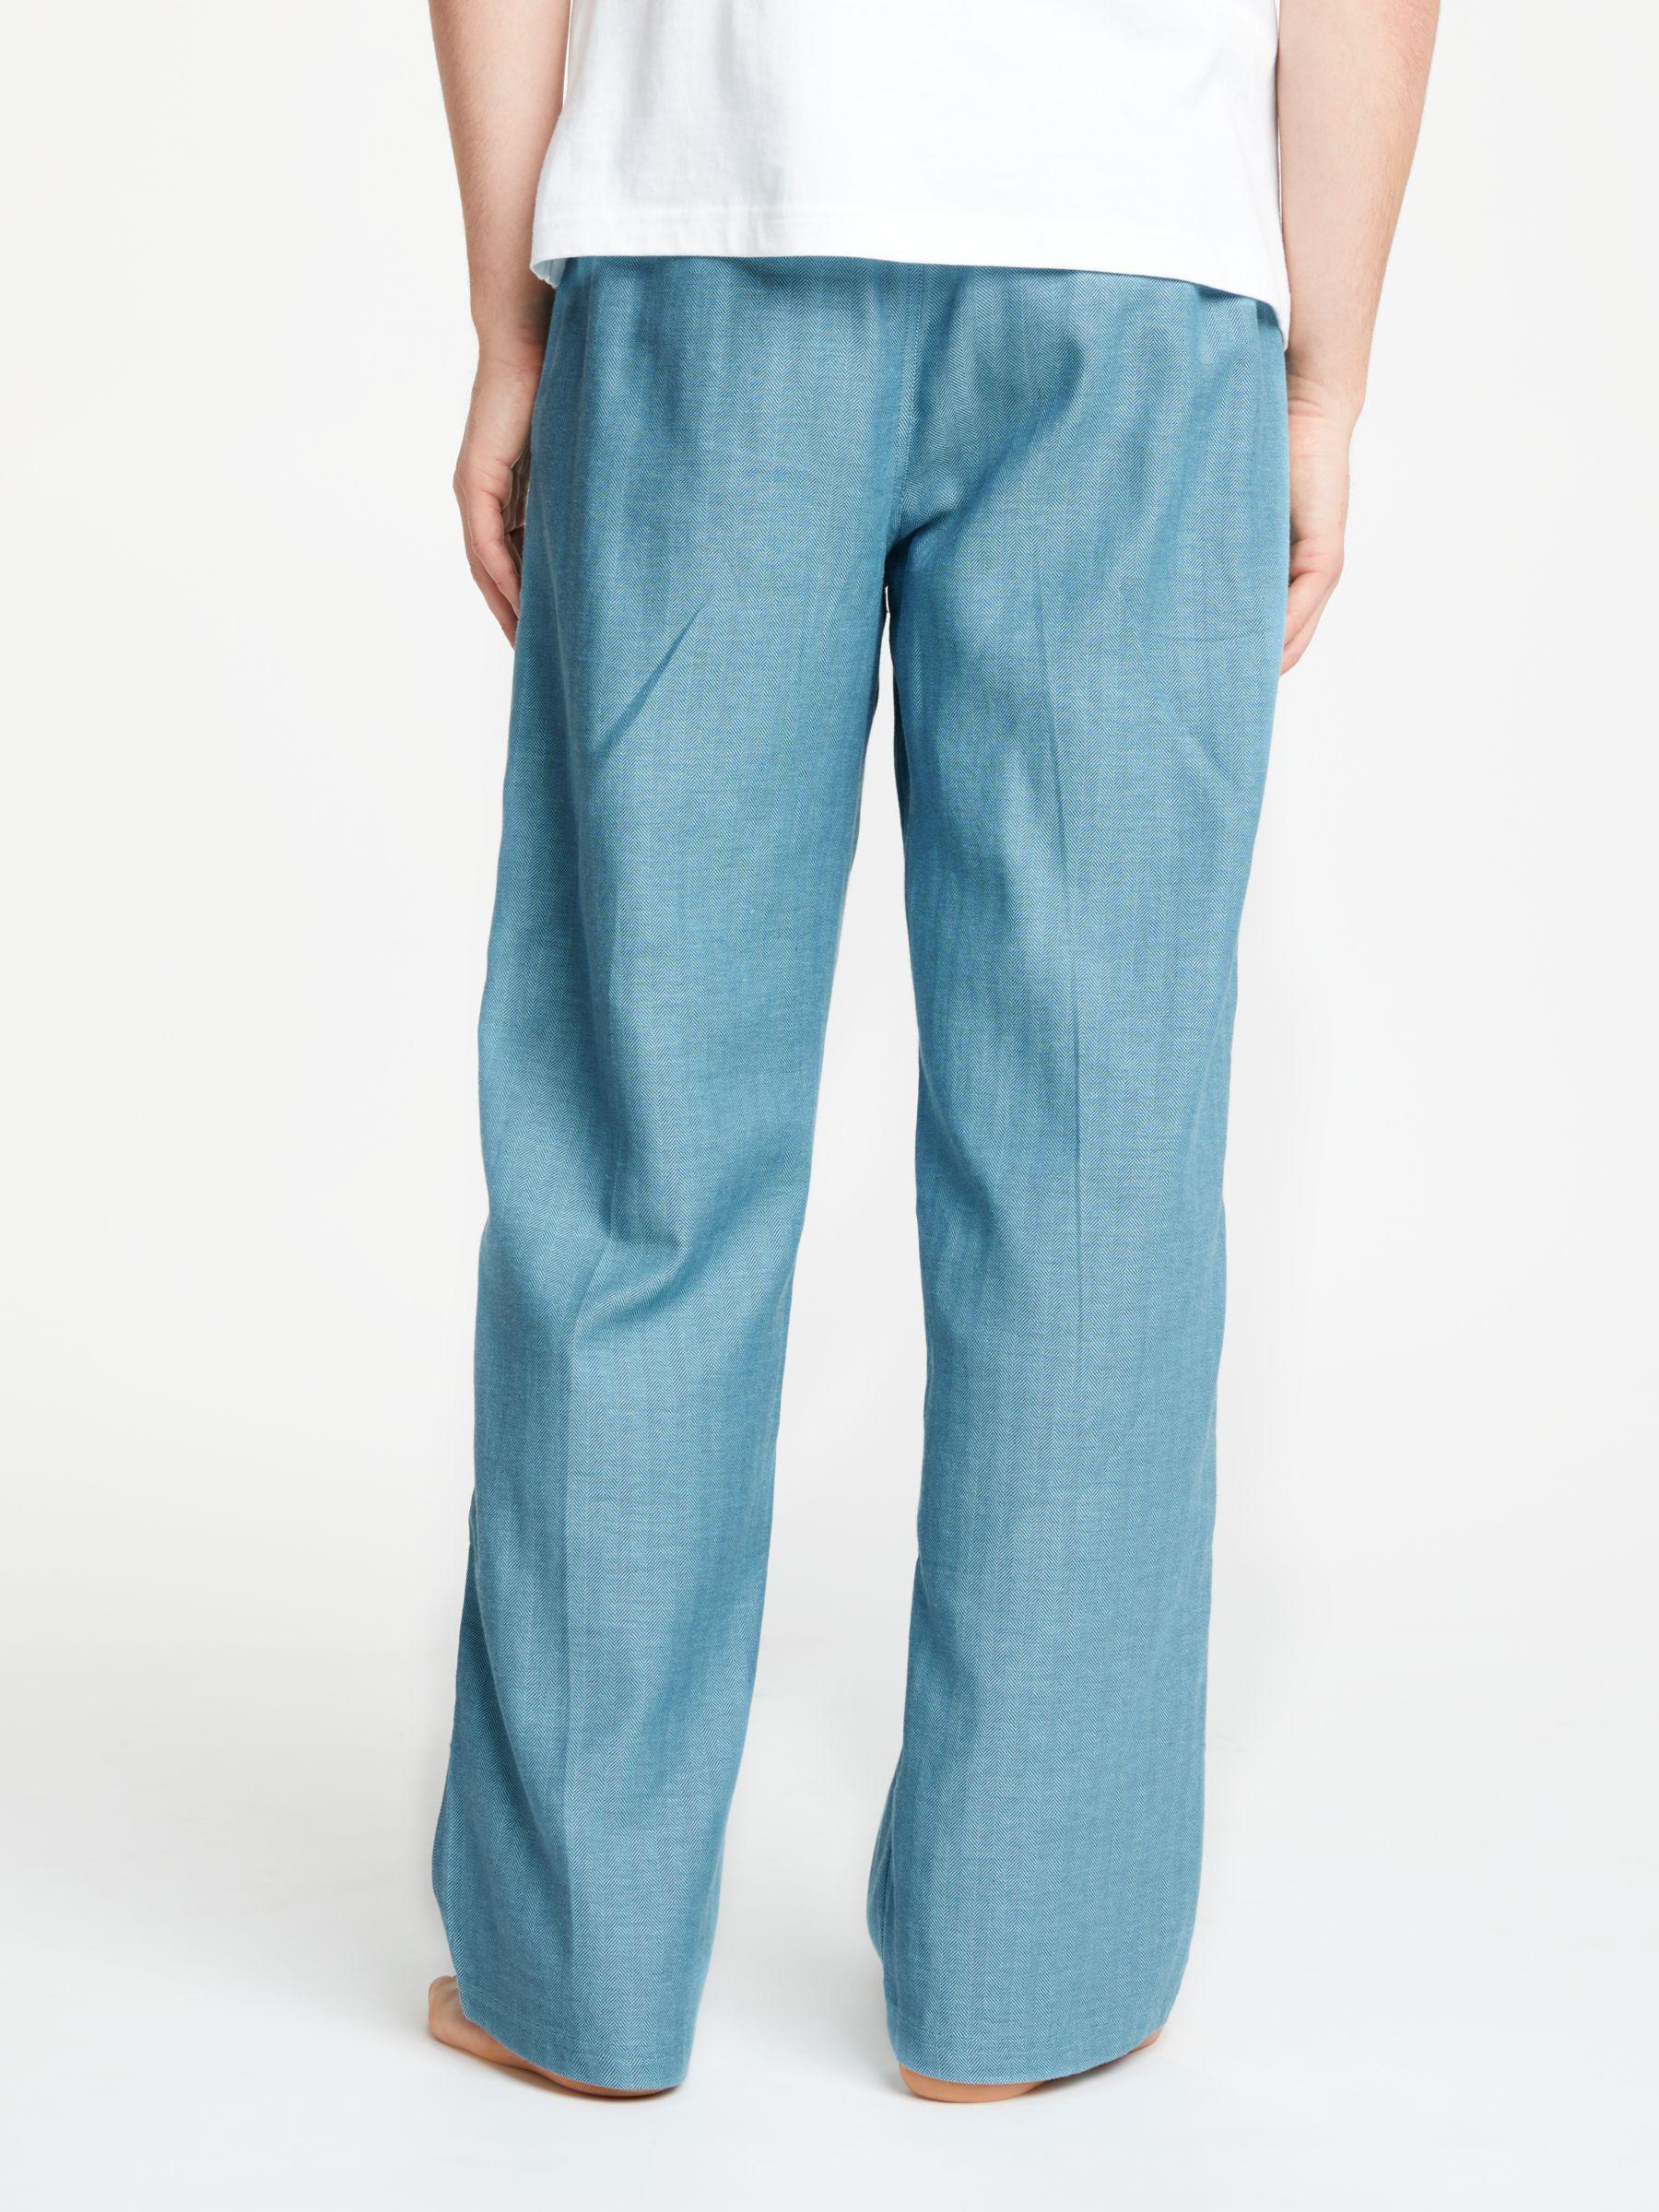 John Lewis Cotton Herringbone Lounge Pants in Blue for Men